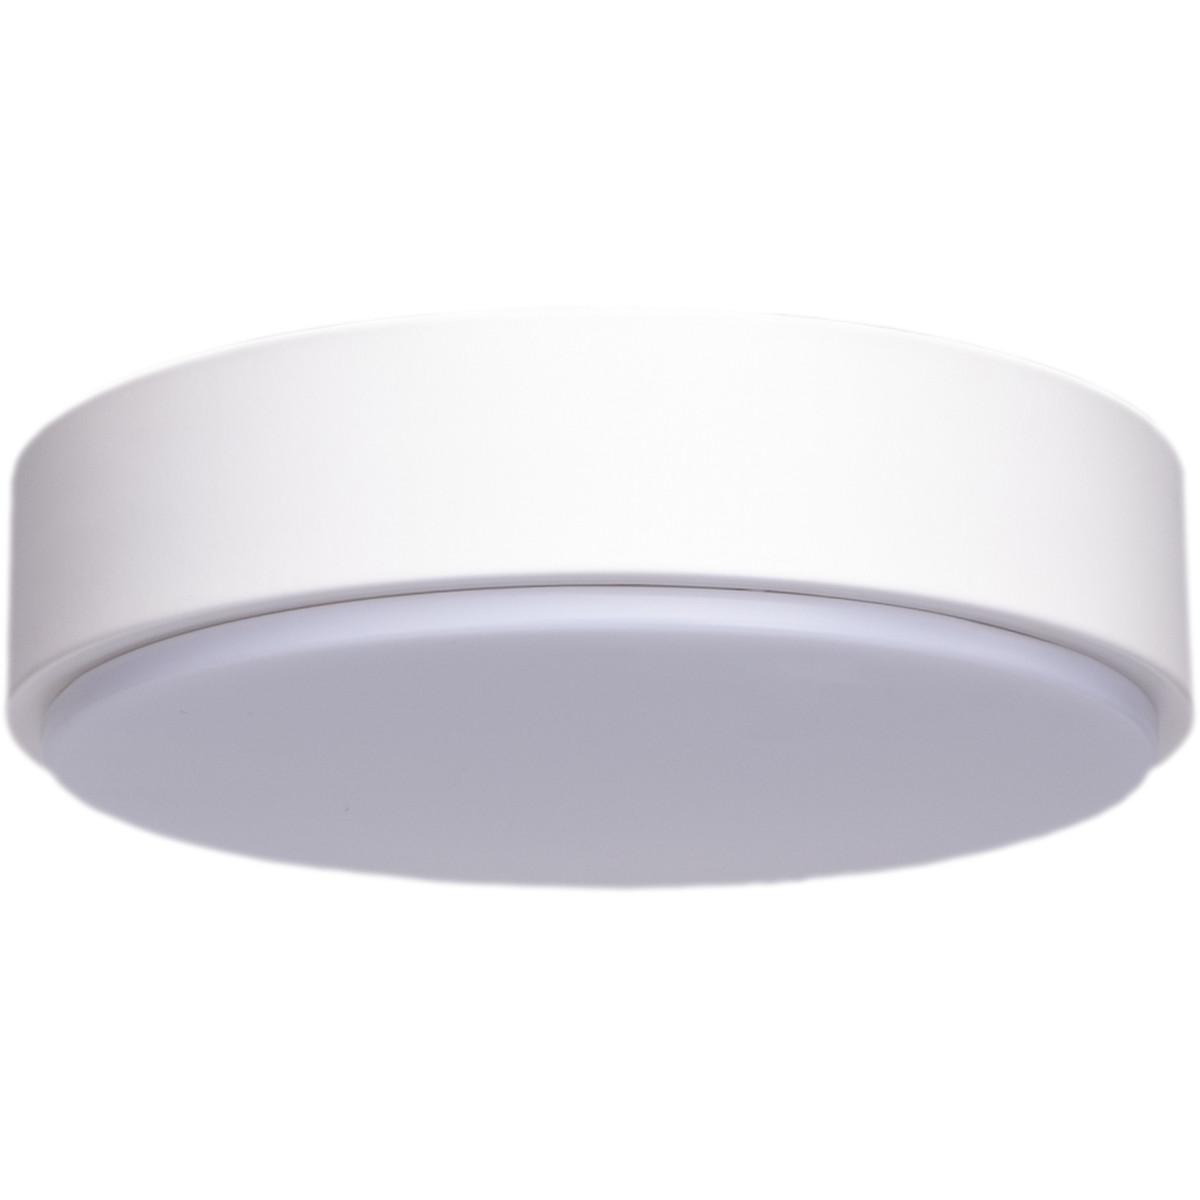 LED Plafondlamp - Aigi Santi - Opbouw Rond 12W - Warm Wit 3000K - Mat Wit Aluminium